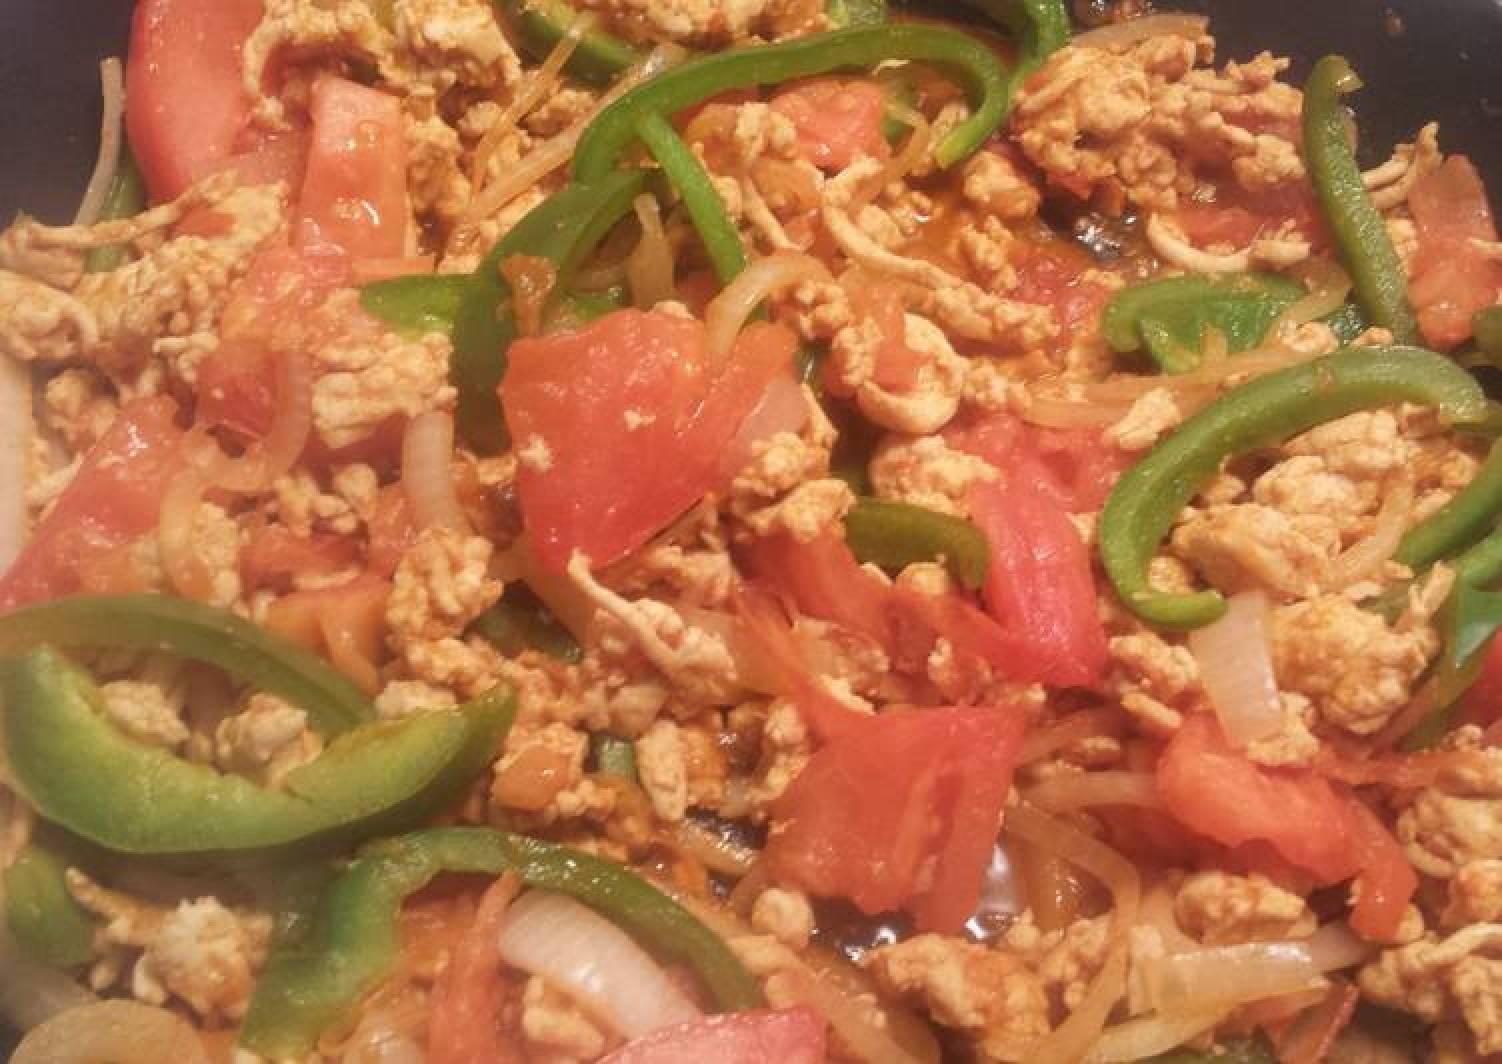 Healthy Turkey Taco/Burrito filling